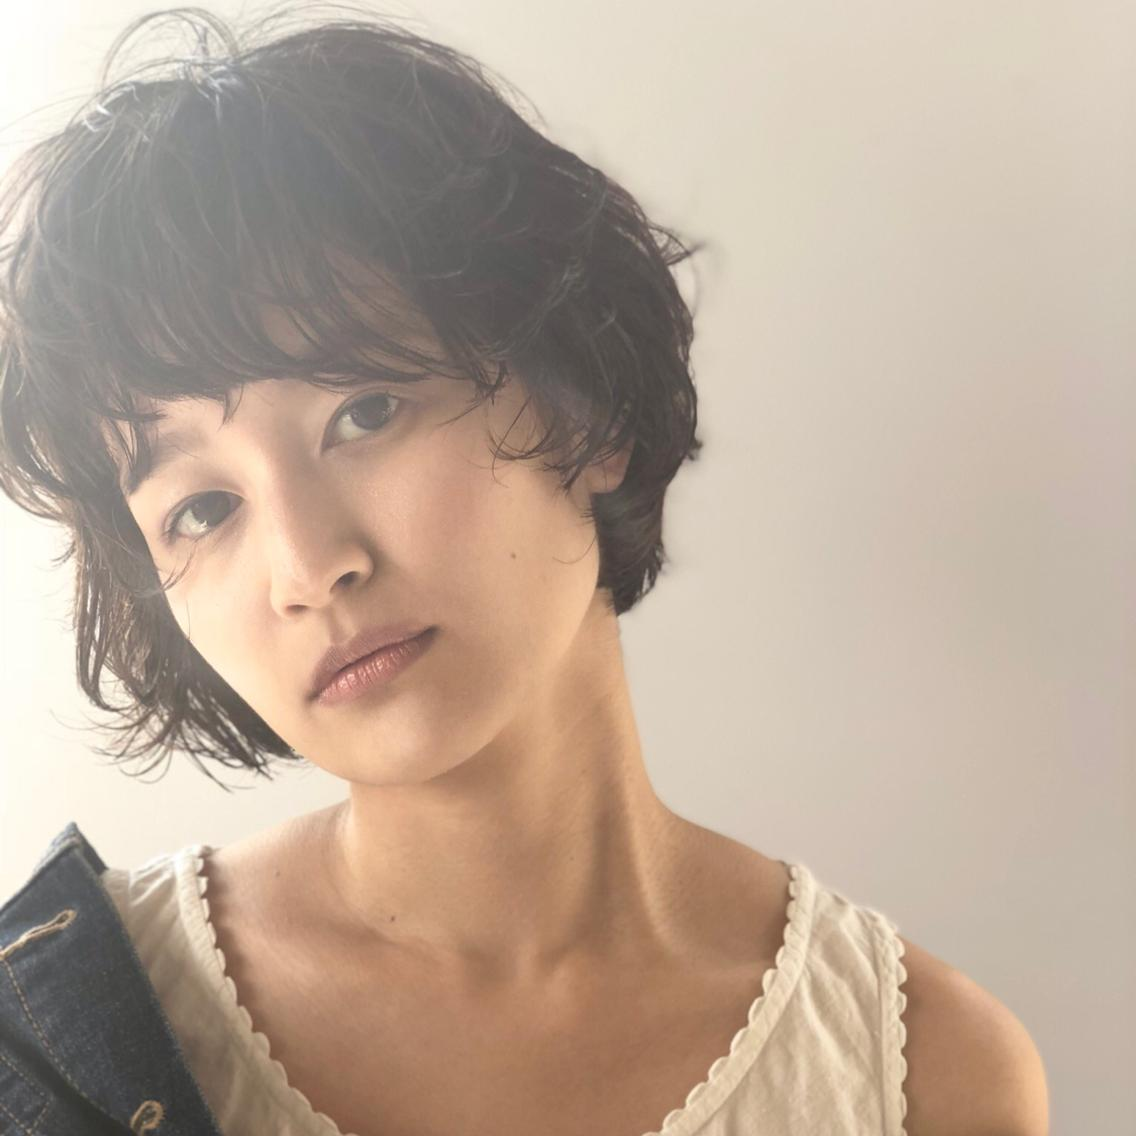 【☾】2017aw サロン撮影モデル募集【☾】